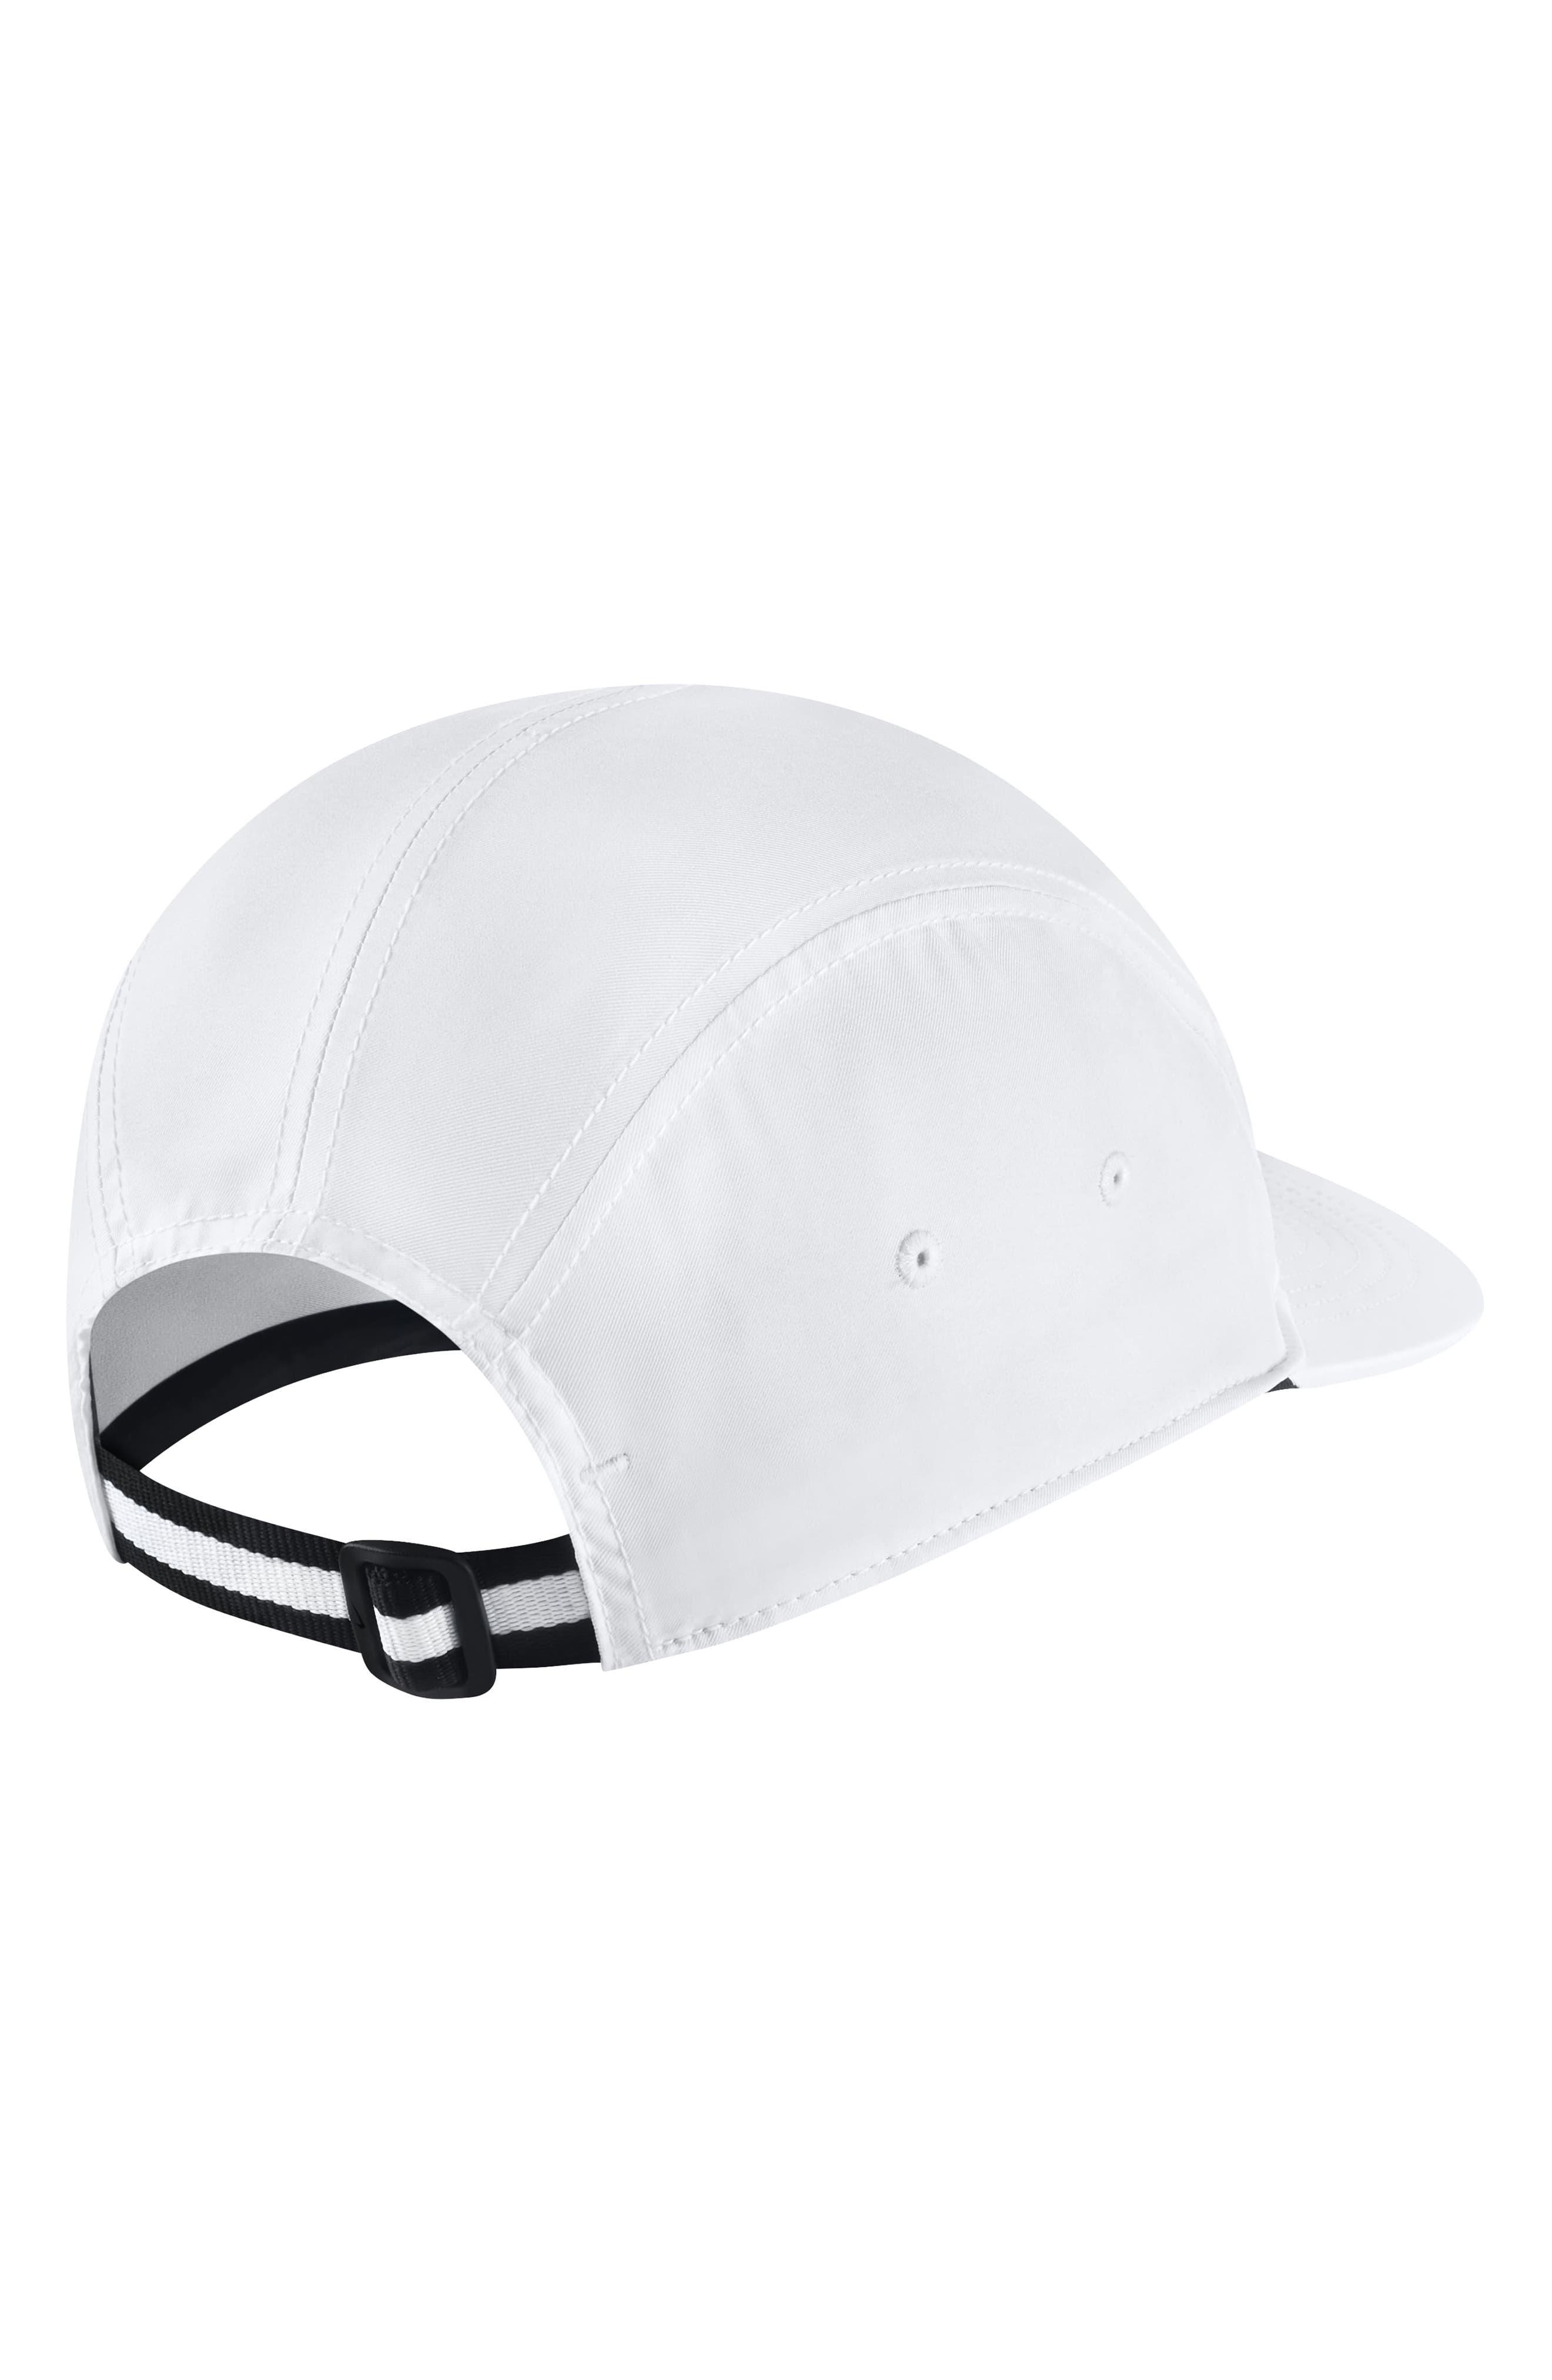 Sportswear NikeLab Baseball Cap,                             Alternate thumbnail 2, color,                             White/ Black/ White/ White